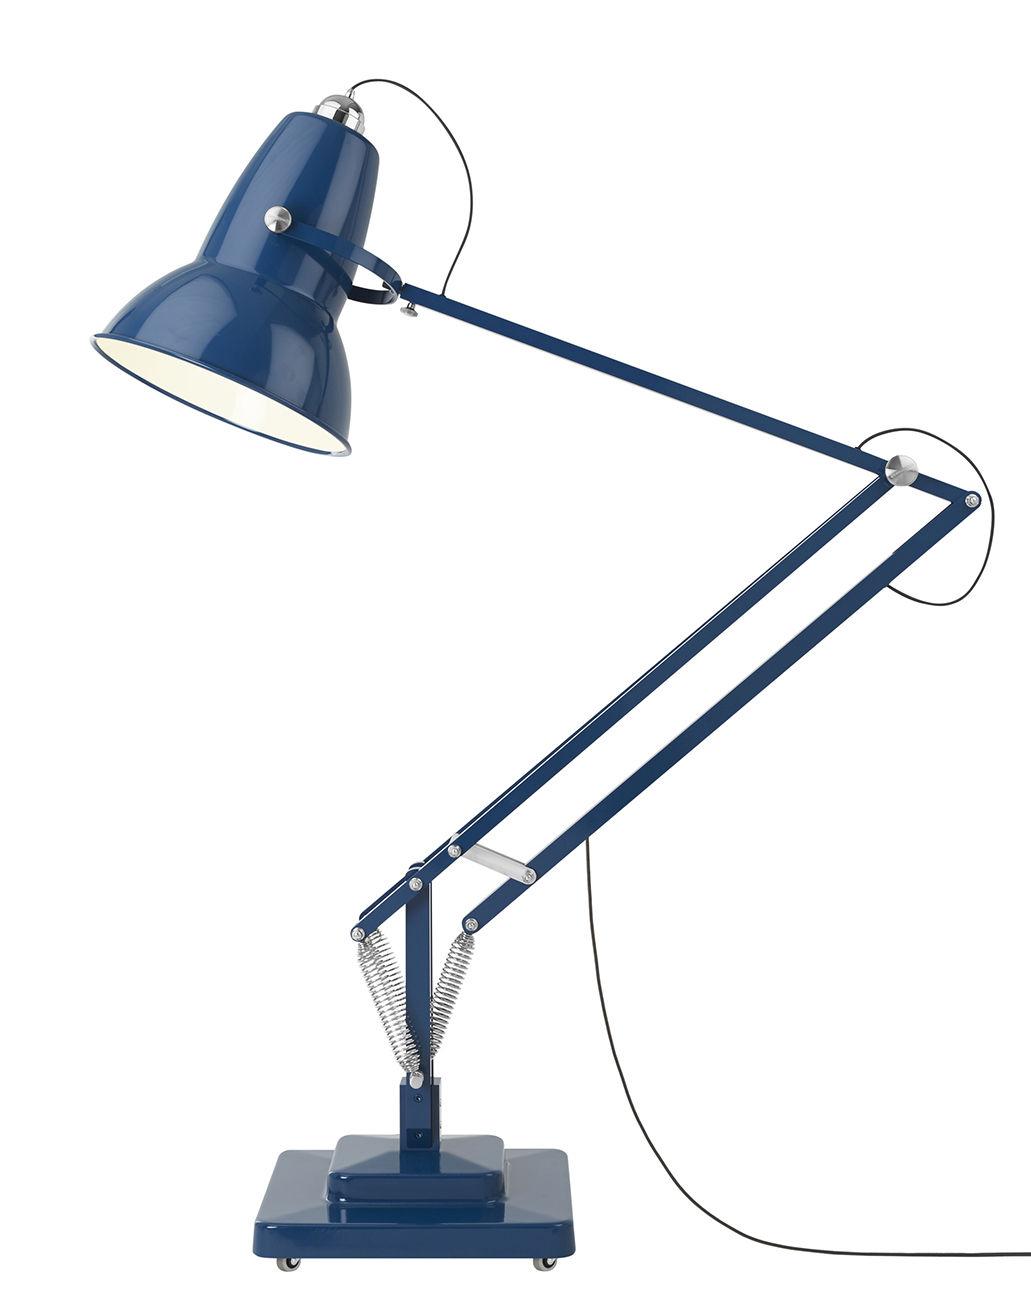 lampadaire original 1227 giant outdoor h 270 cm bleu marine anglepoise. Black Bedroom Furniture Sets. Home Design Ideas